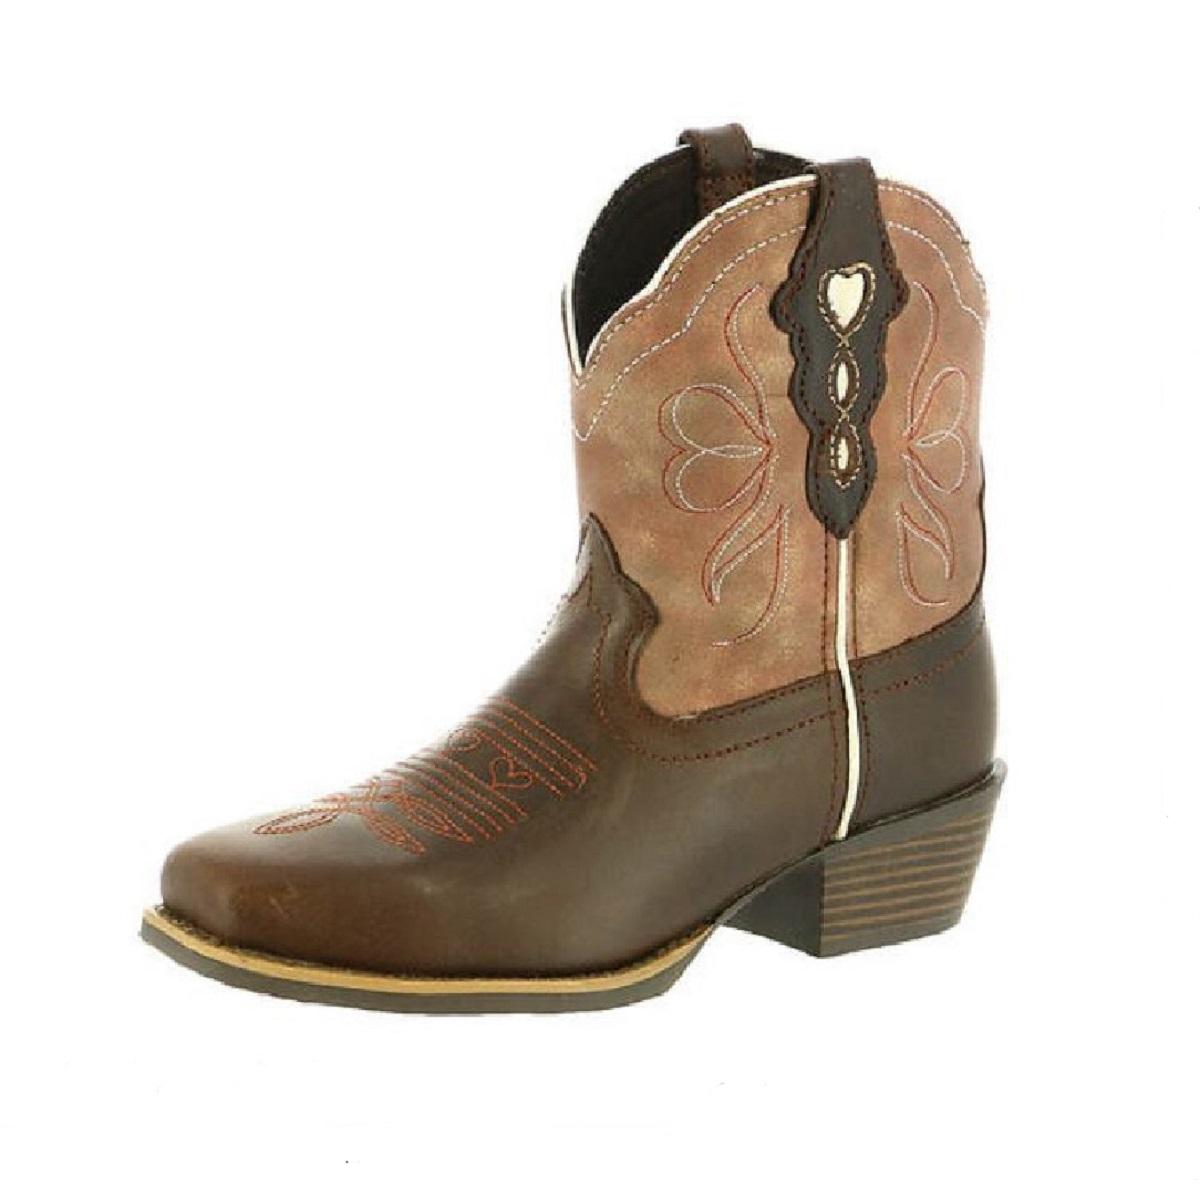 4e5dbda14fc Ladies Justin Boot Chellie Chocolate